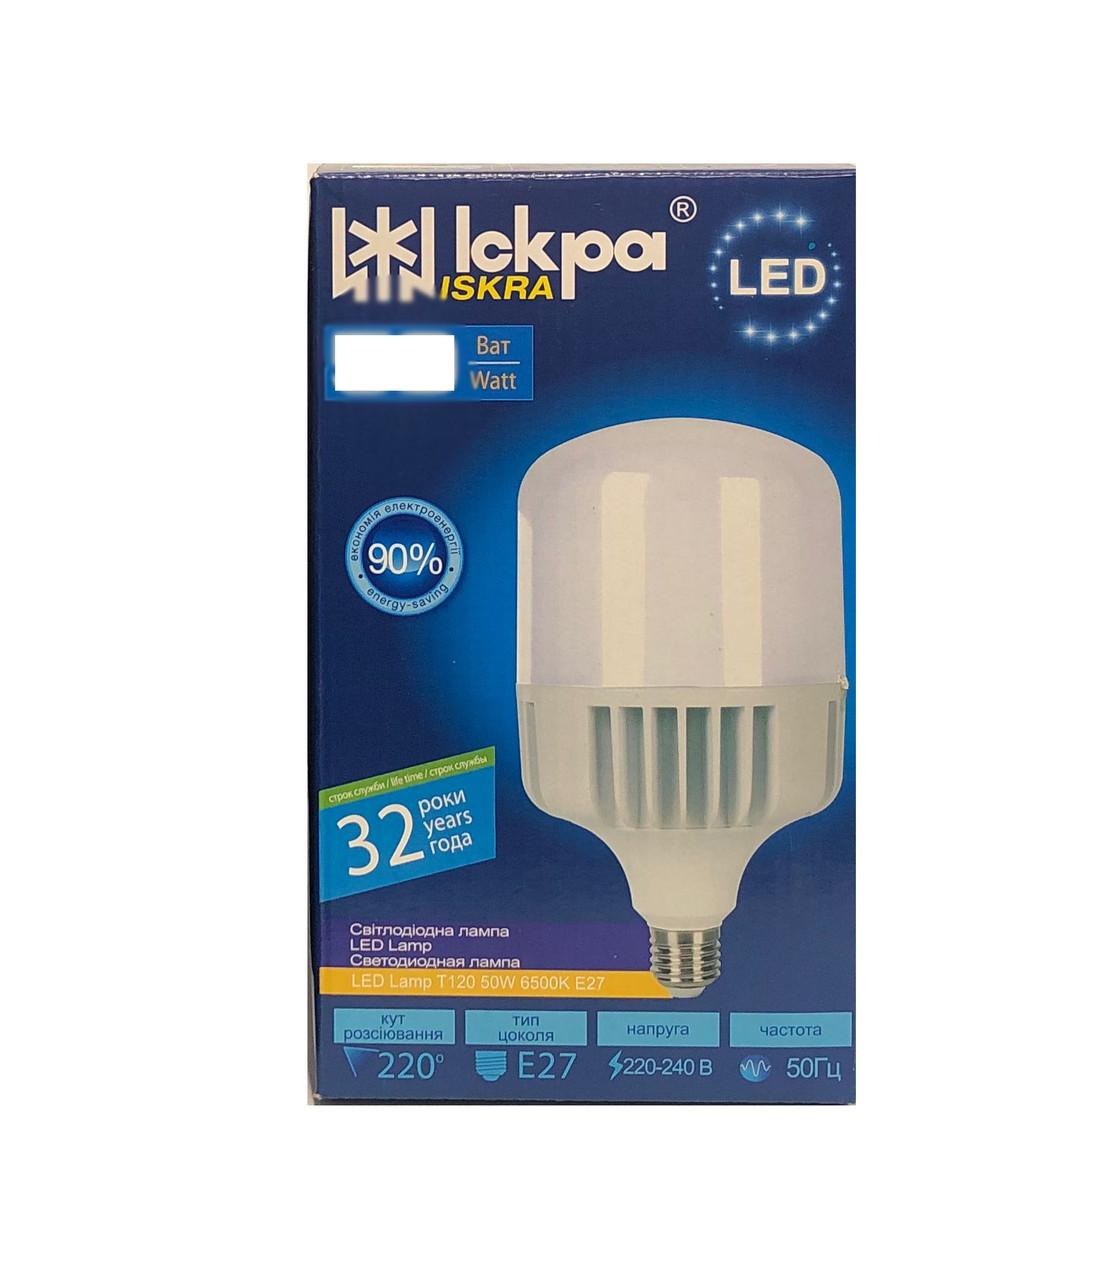 Лампа светодиодная промышленная LED 70Вт (Т150)  220B, E40 , Холоднобіла